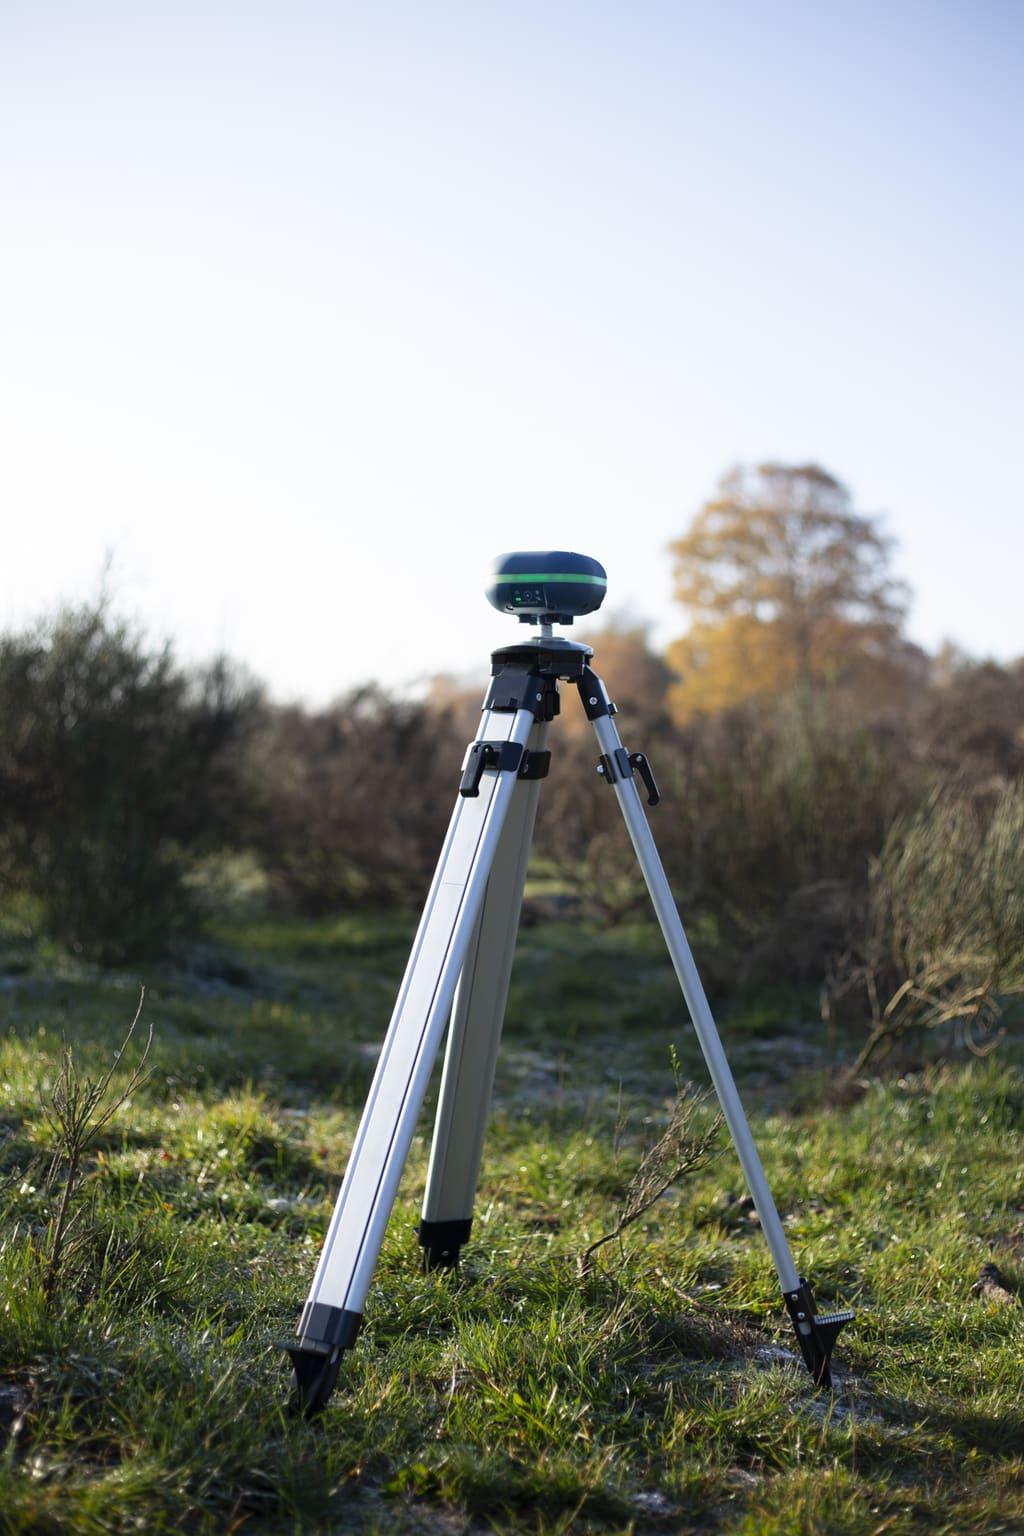 marxact uni-gr1 on a tripod outside